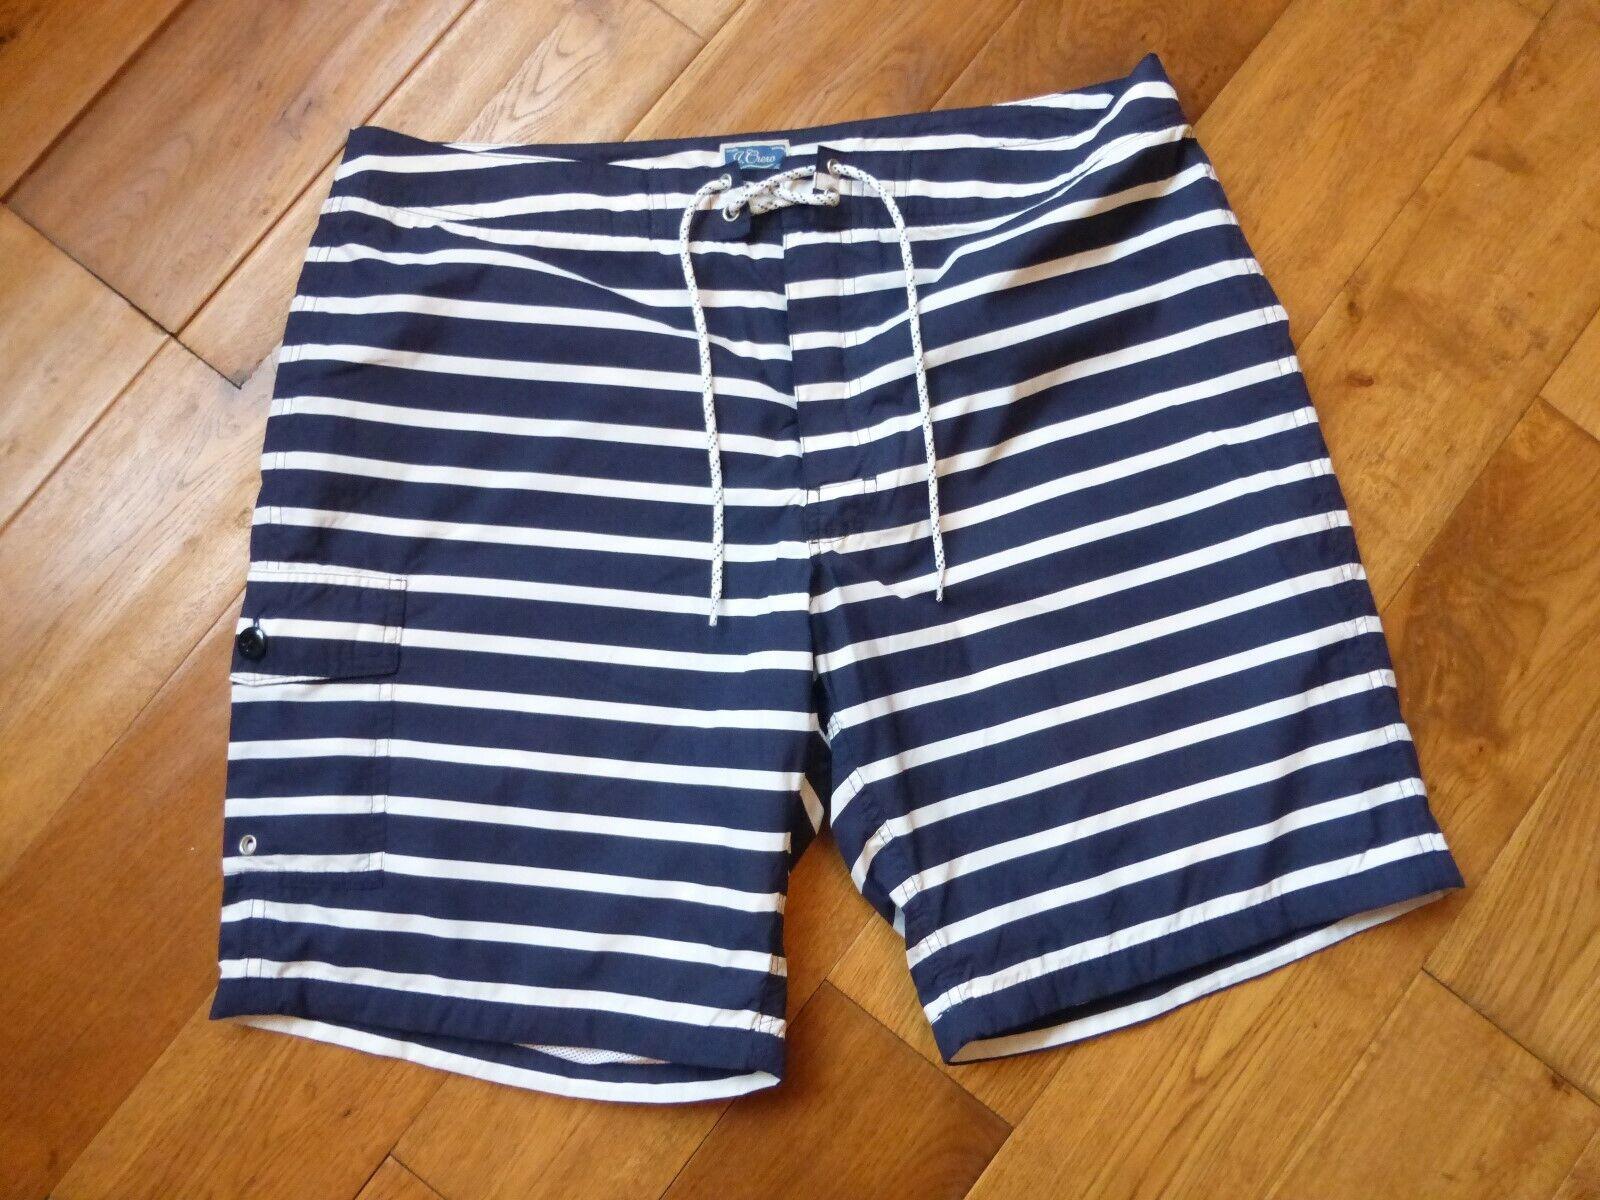 BNWT J. Crew men's 9 inch Board shorts in navy stripe W 36 NEW swim swimwear